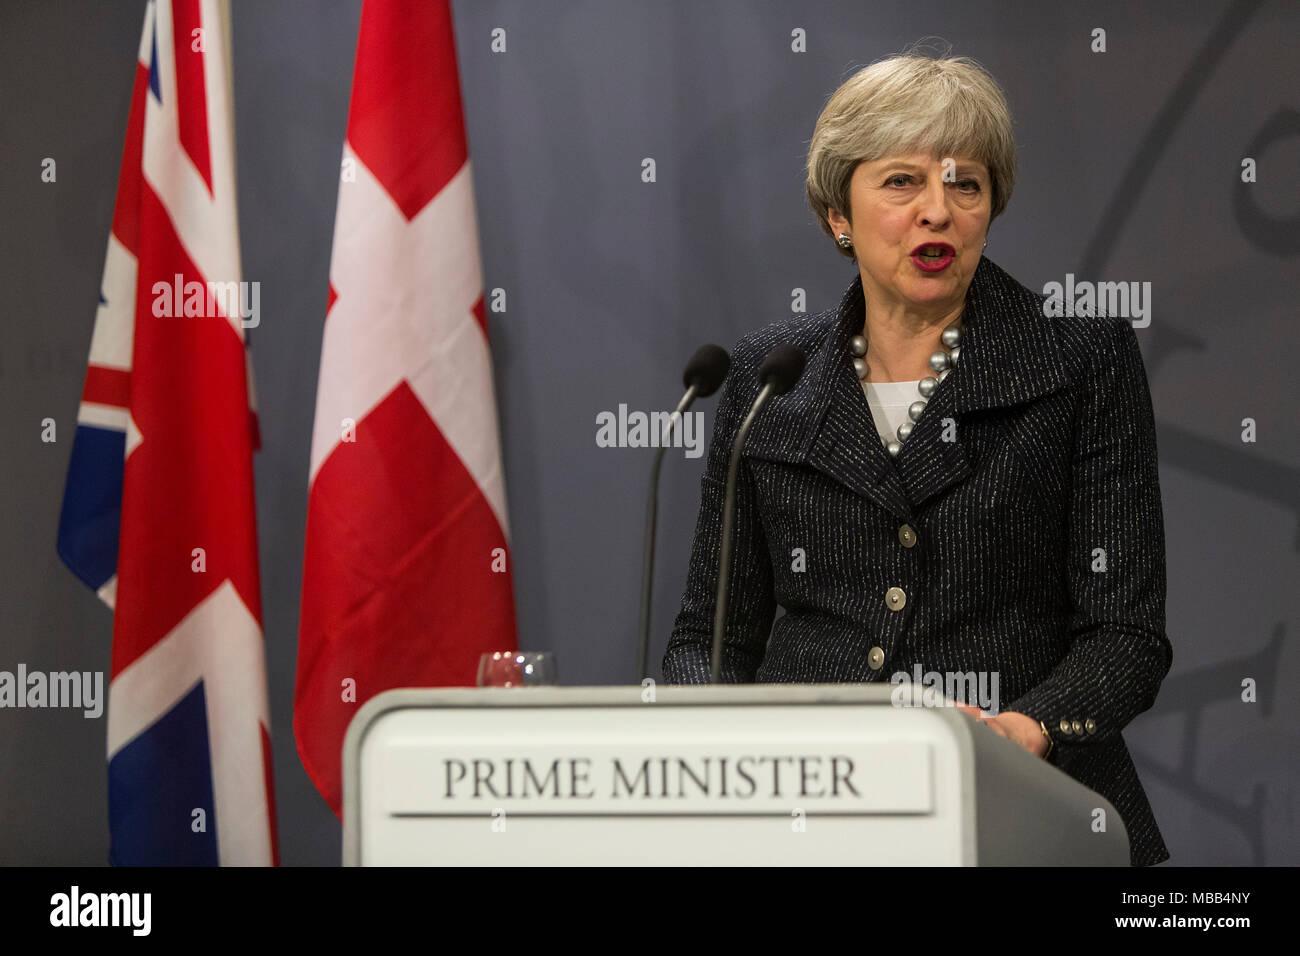 Copenhagen, Denmark - April 09, 2018: British Prime Minister Theresa May visits Danish Prime Minister Lars Loekke Rasmussen in Copenhagen, Denmark, to discuss the poisen attack in Salisbury, England, and Brexit. Credit: OJPHOTOS/Alamy Live News - Stock Image